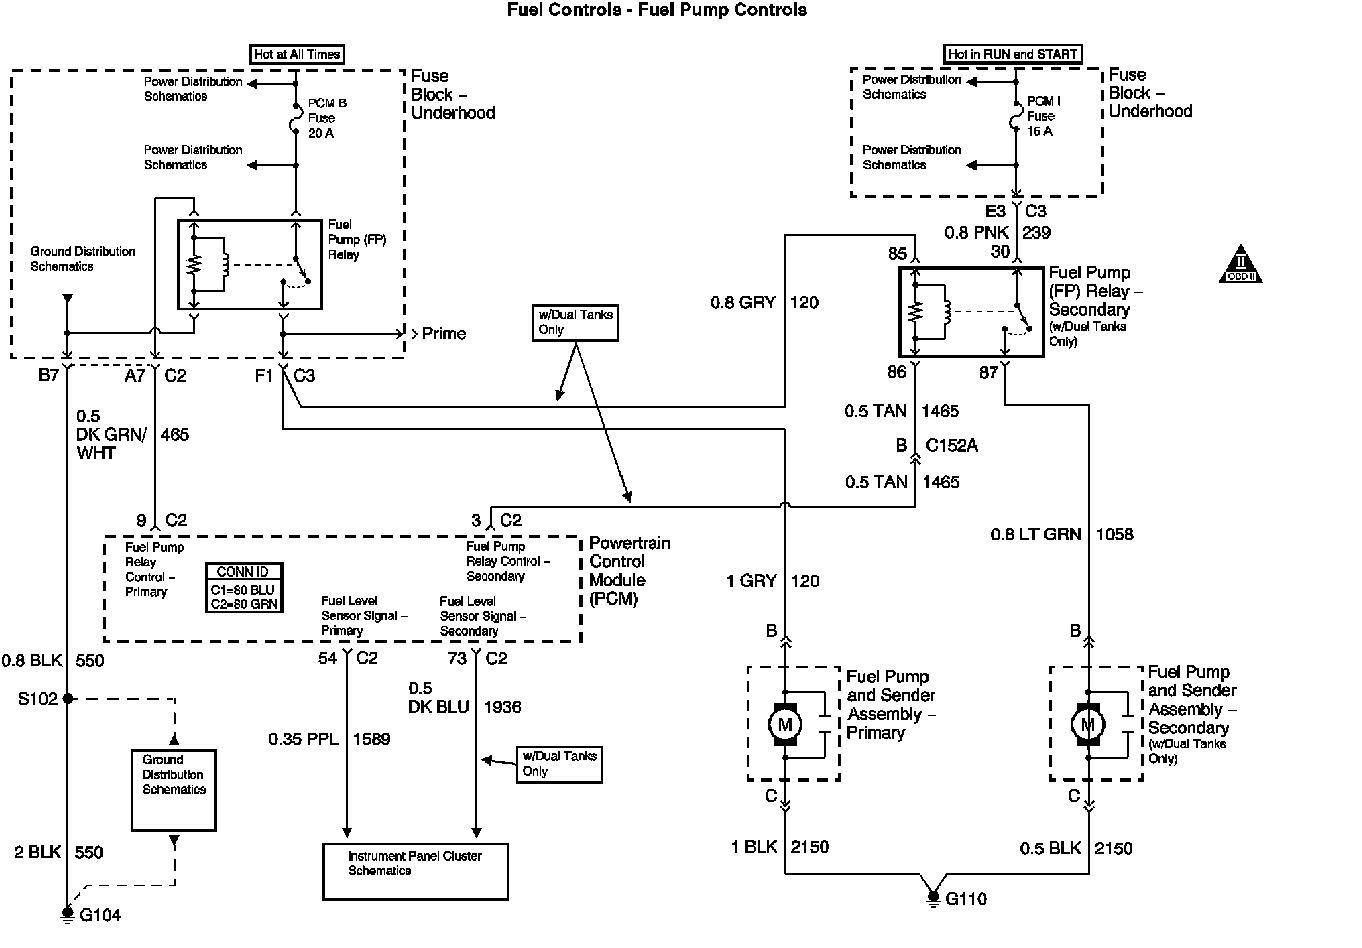 Fancy 2003 Chevy Silverado Wiring Diagram 49 For Your 2005 Chevy Silverado Wiring Diagram with 2003 Chevy Silverado Wiring Diagram